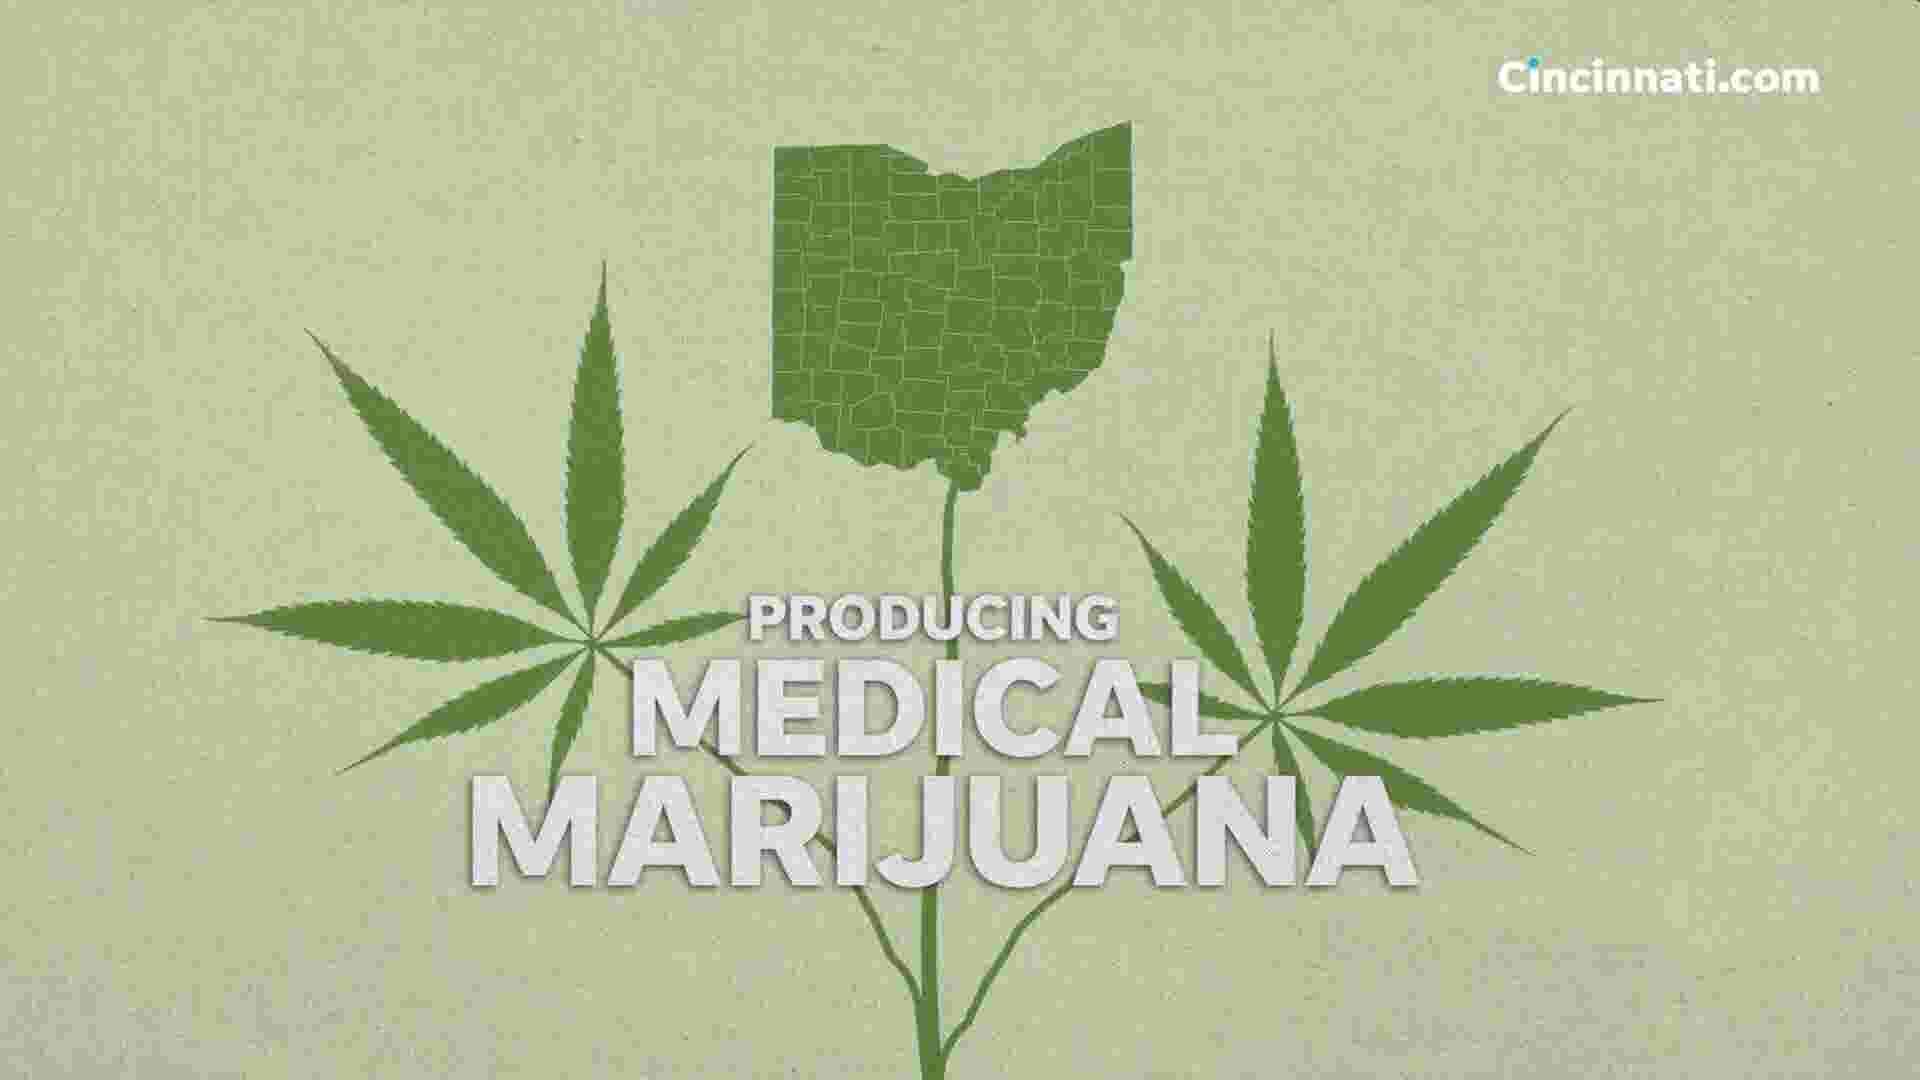 Growing medical marijuana: Ohio's seed to sale process